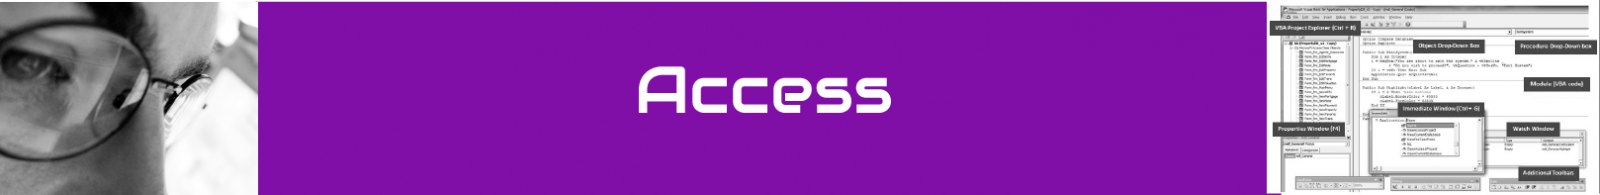 Banner_MSACCESS_V4